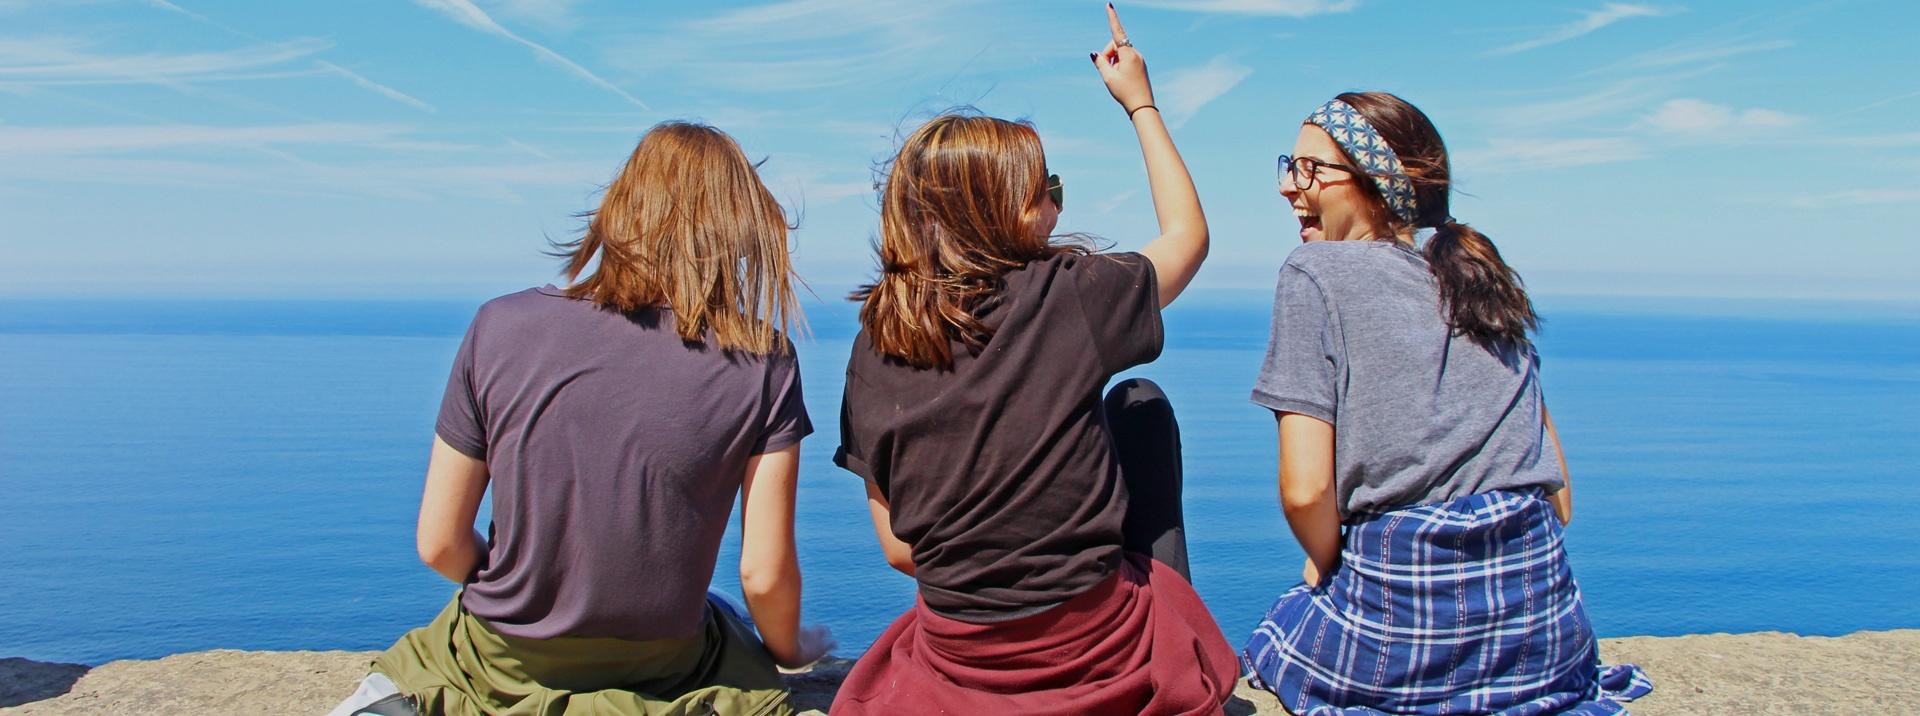 Dublin interns at Cliffs of Moher